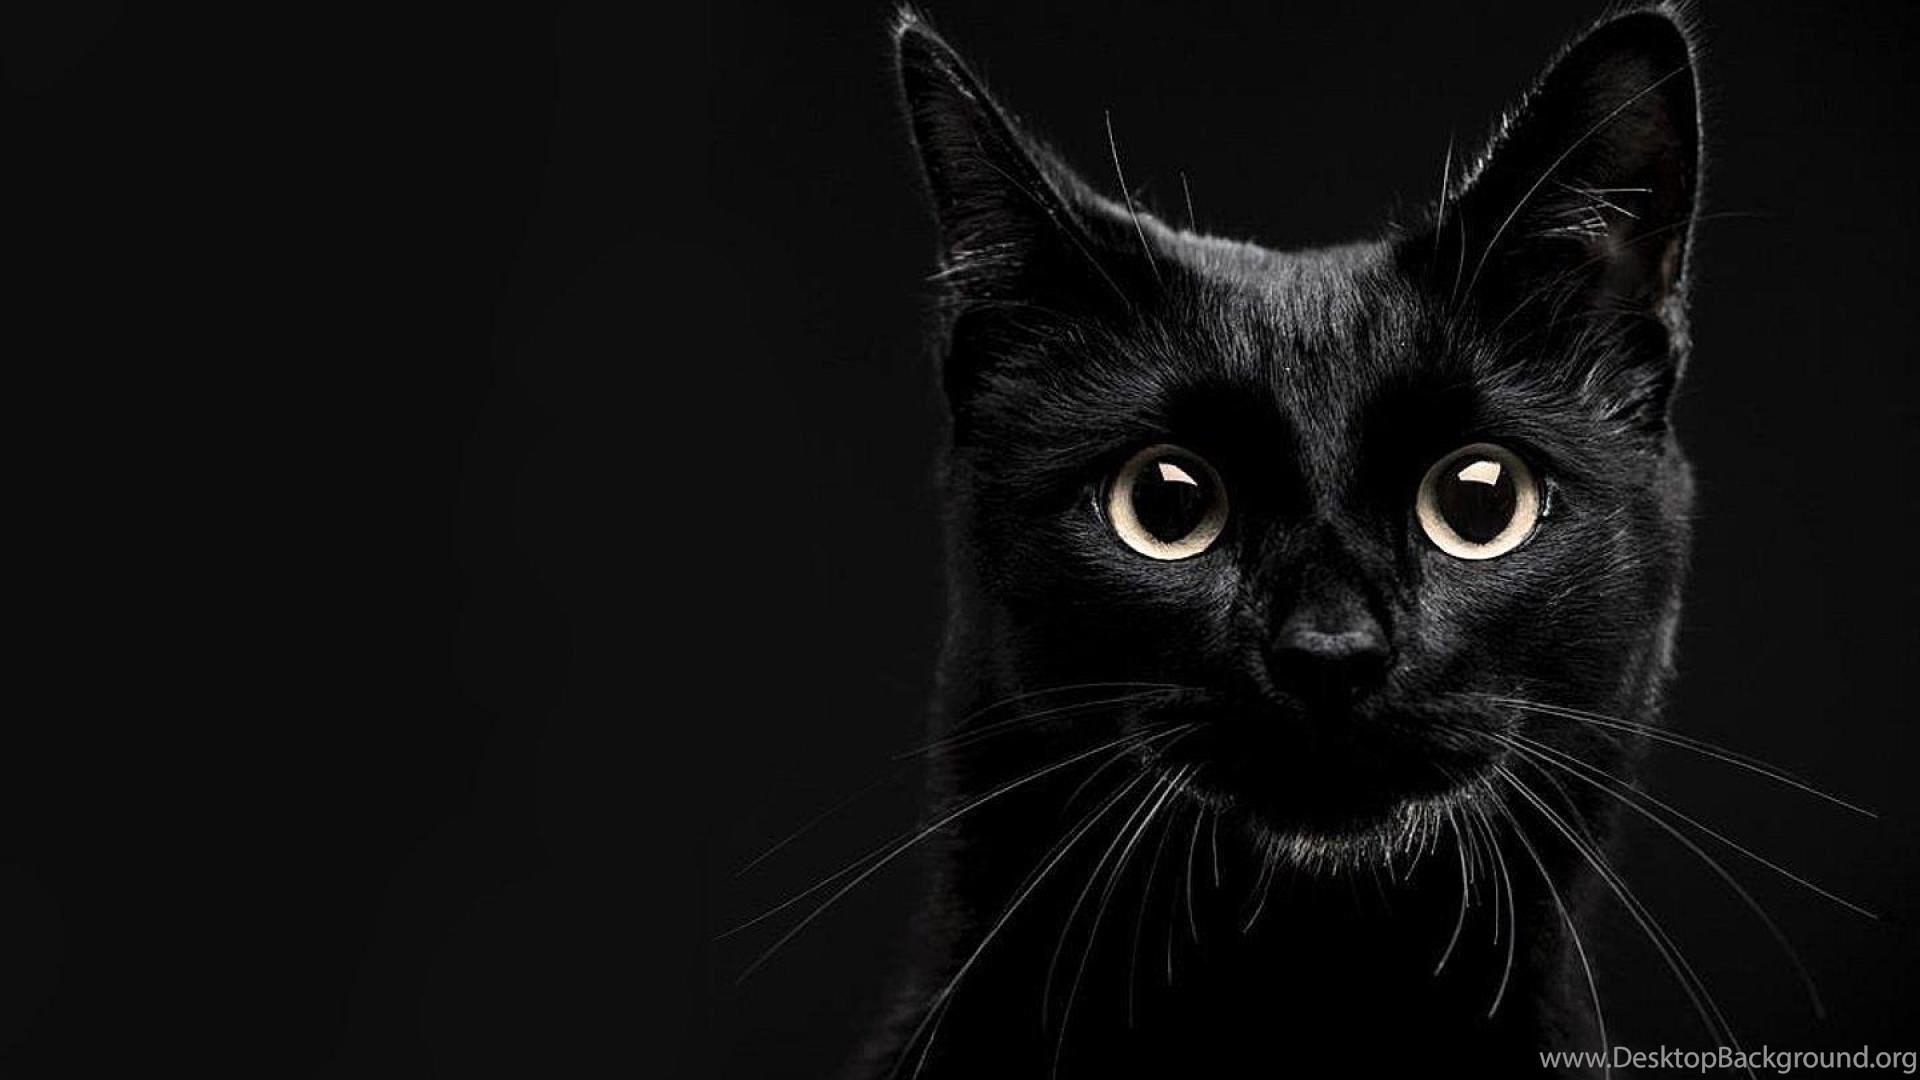 Lucky black cat wallpapers desktop background - Free wallpaper of kittens ...